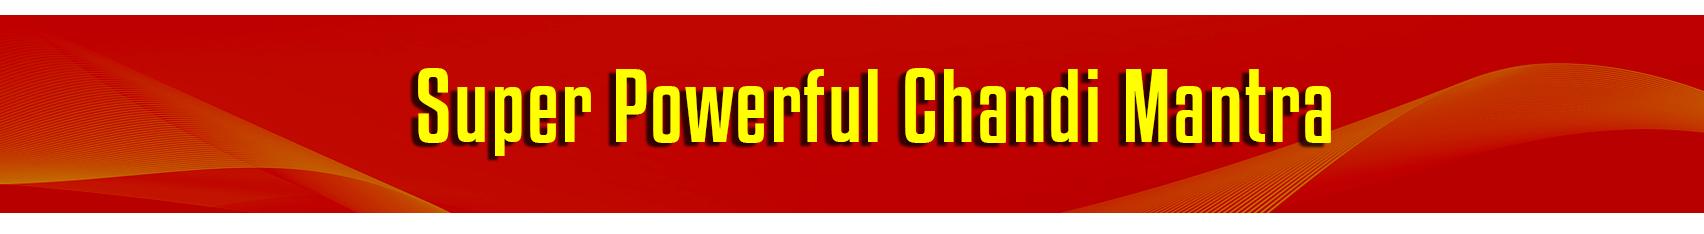 Chandi-Mantra